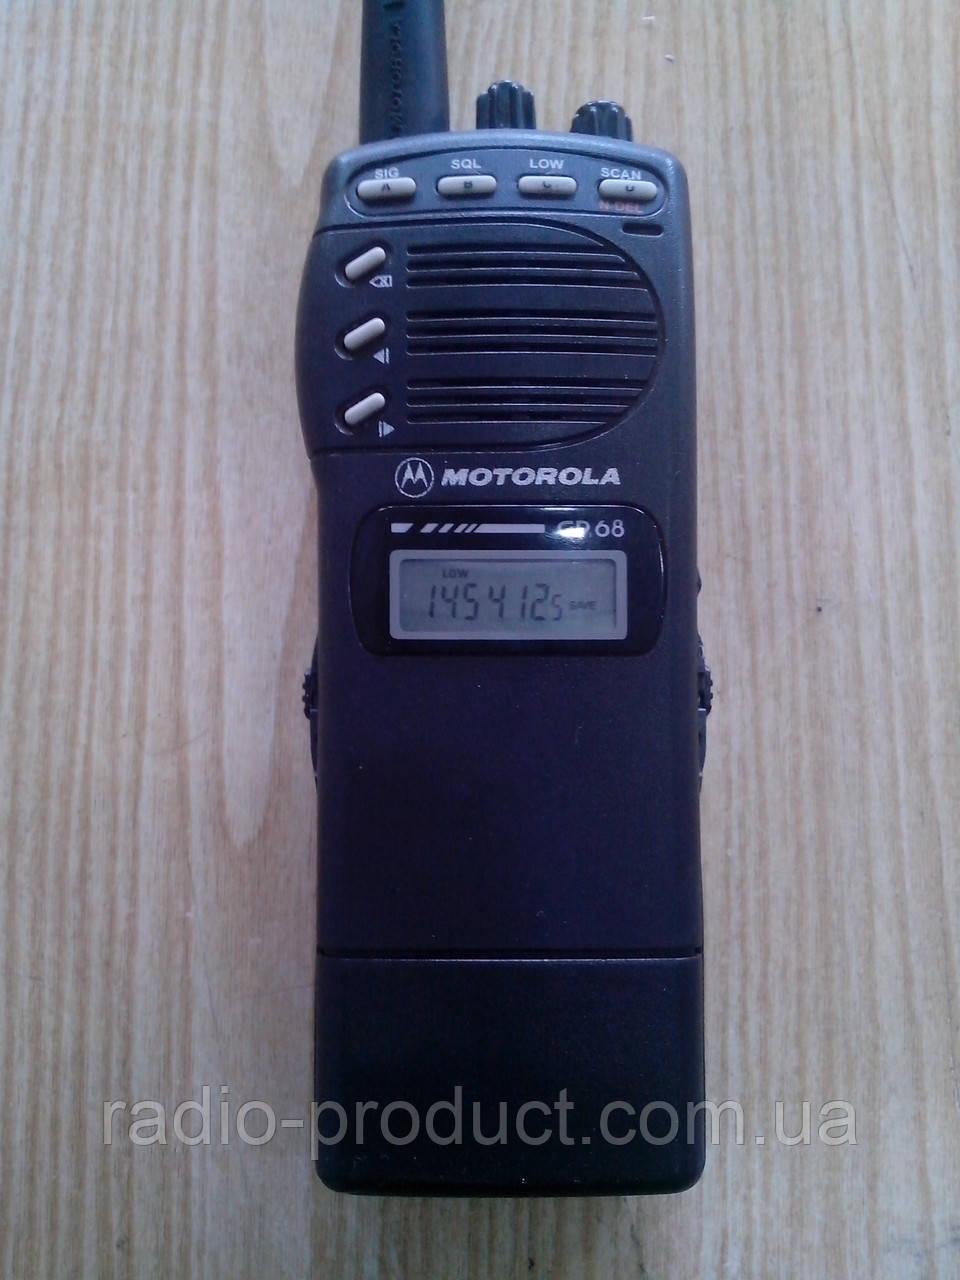 Motorola GP68 VHF, б/у, комплект